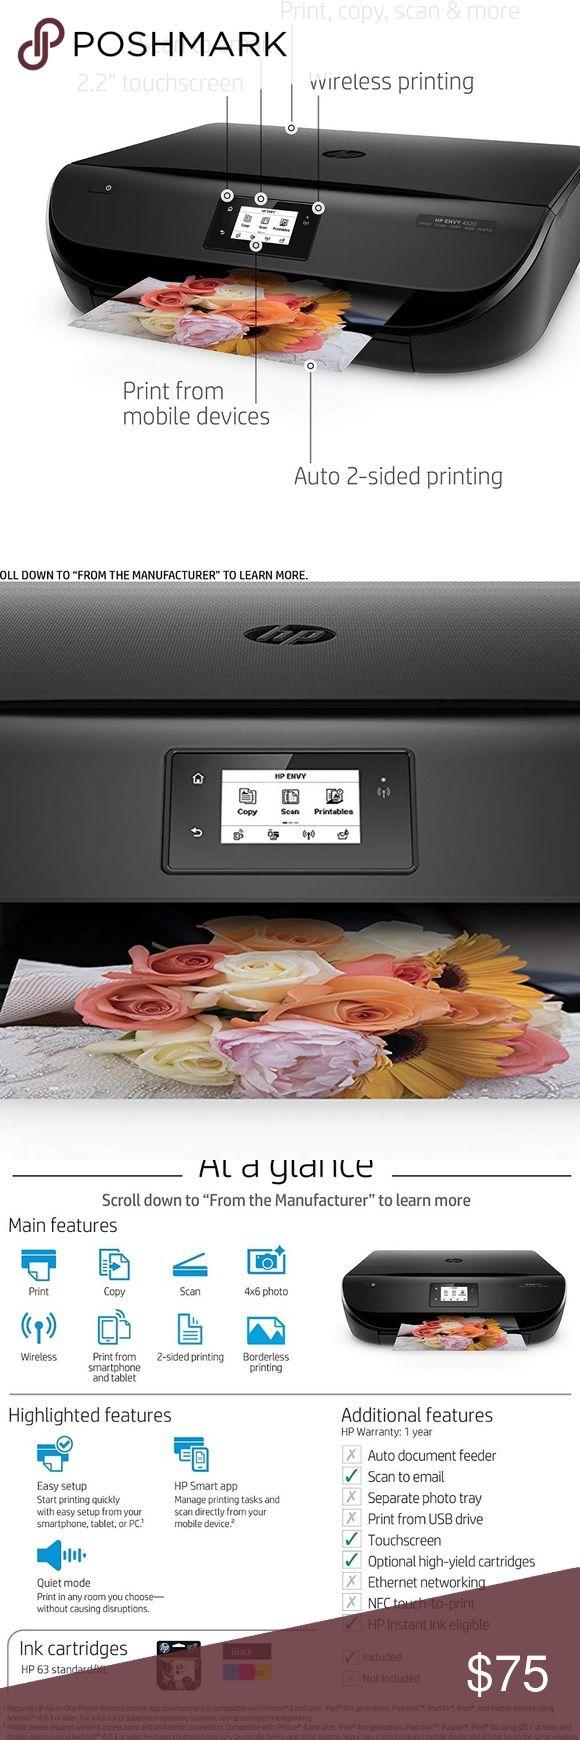 HP Envy 4520 Wireless AllinOne Photo Printer Main